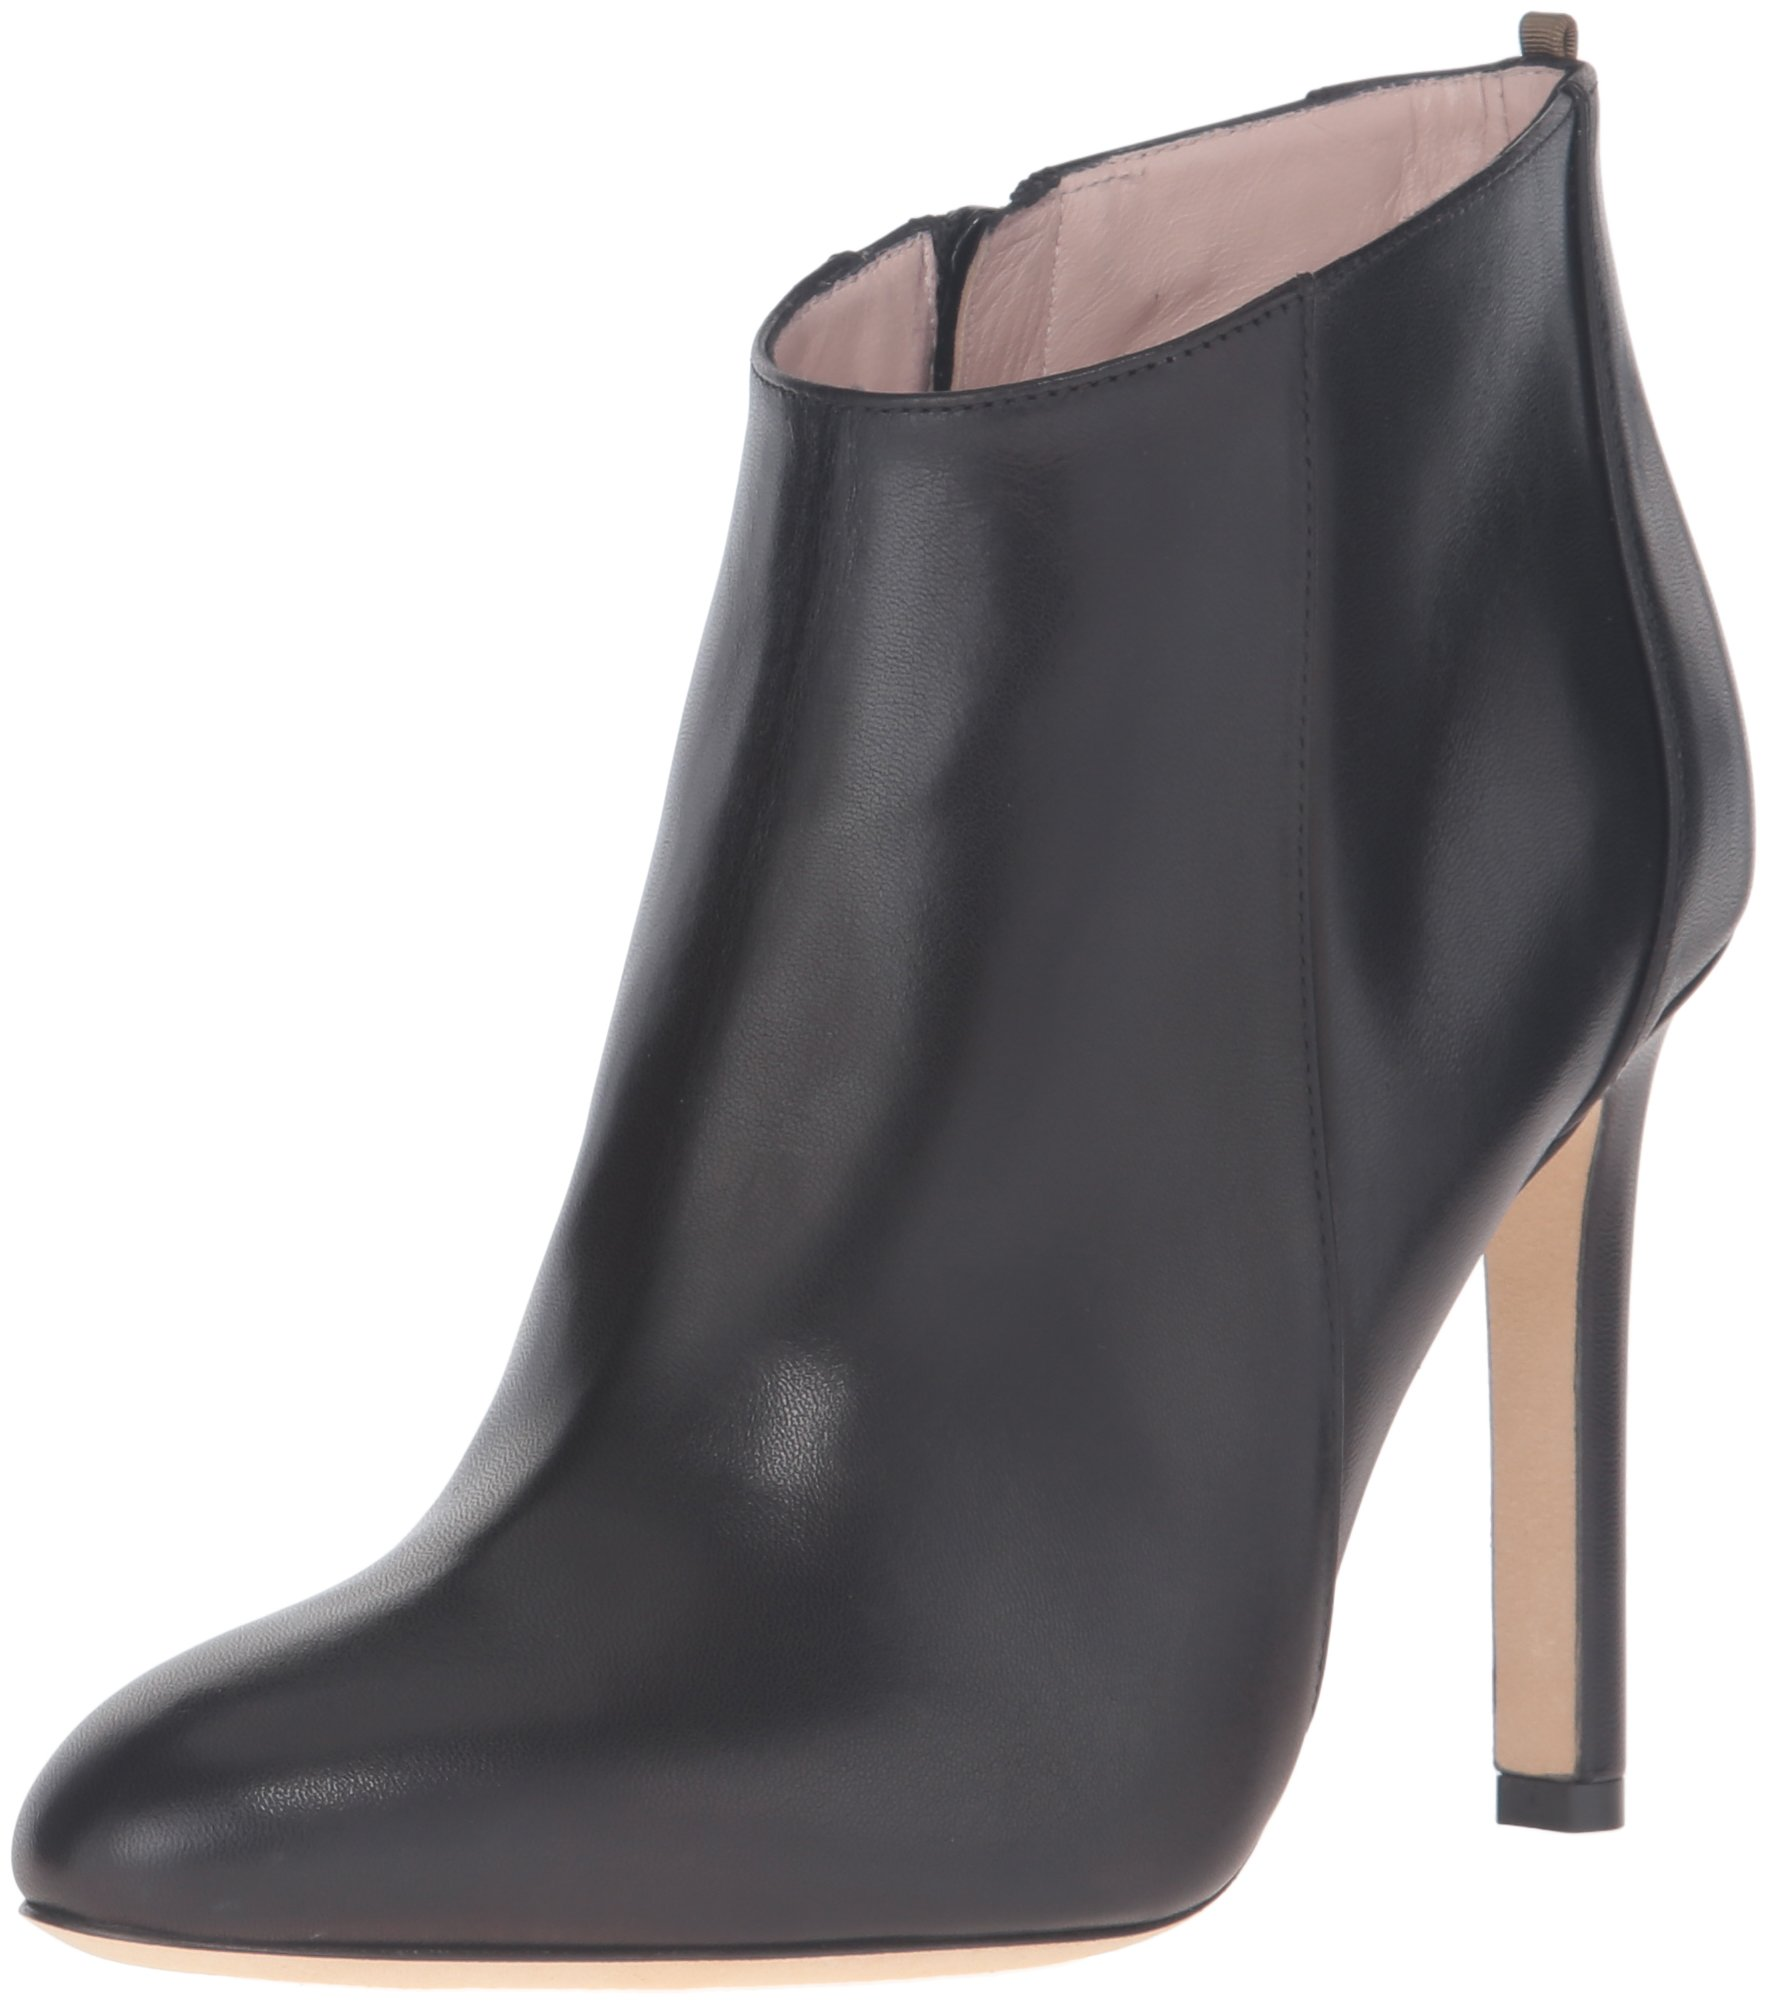 SJP by Sarah Jessica Parker Women's Neue Dress Pump, Black Leather, 38 EU/7.5 M US